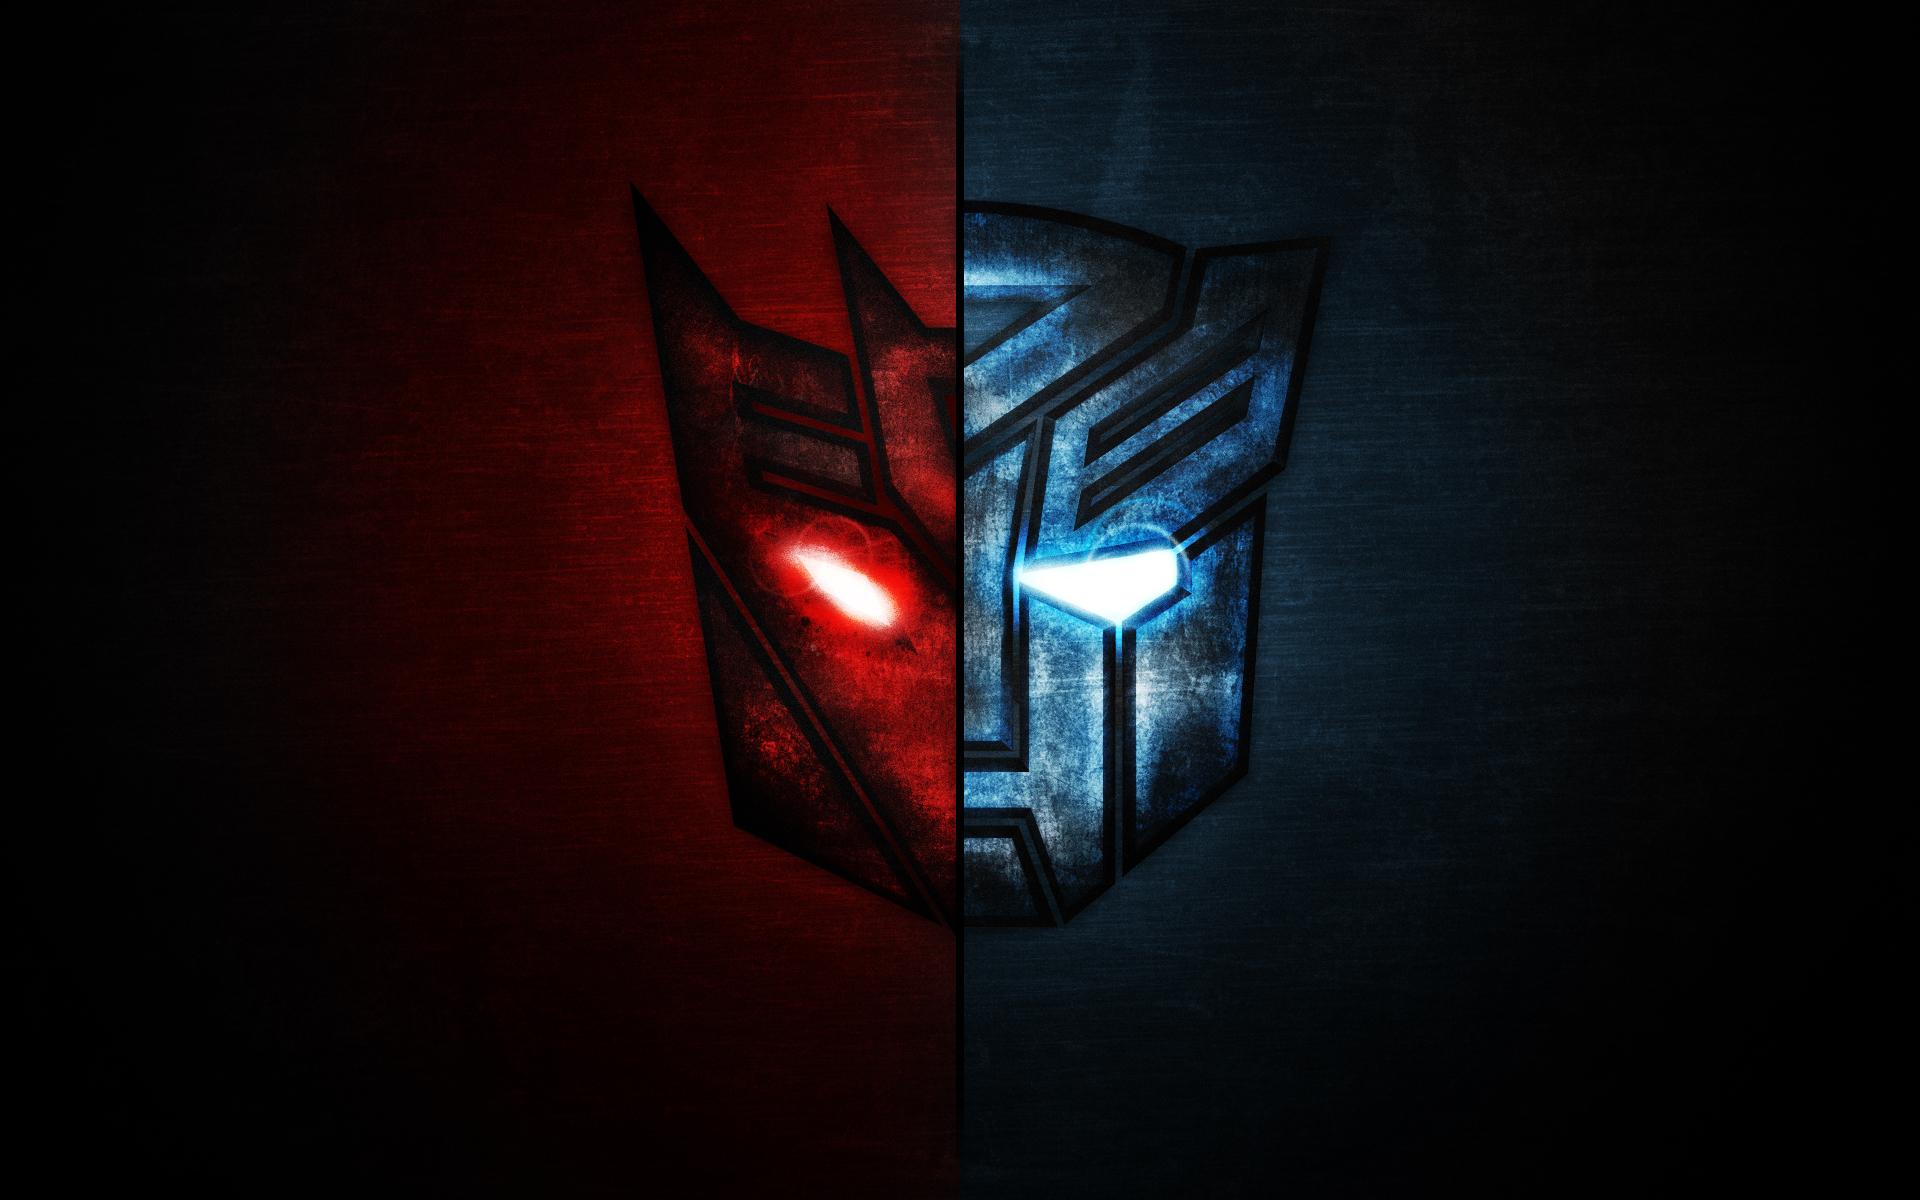 Transformers wallpaper 1920x1200 11   hebusorg   High Definition 1920x1200